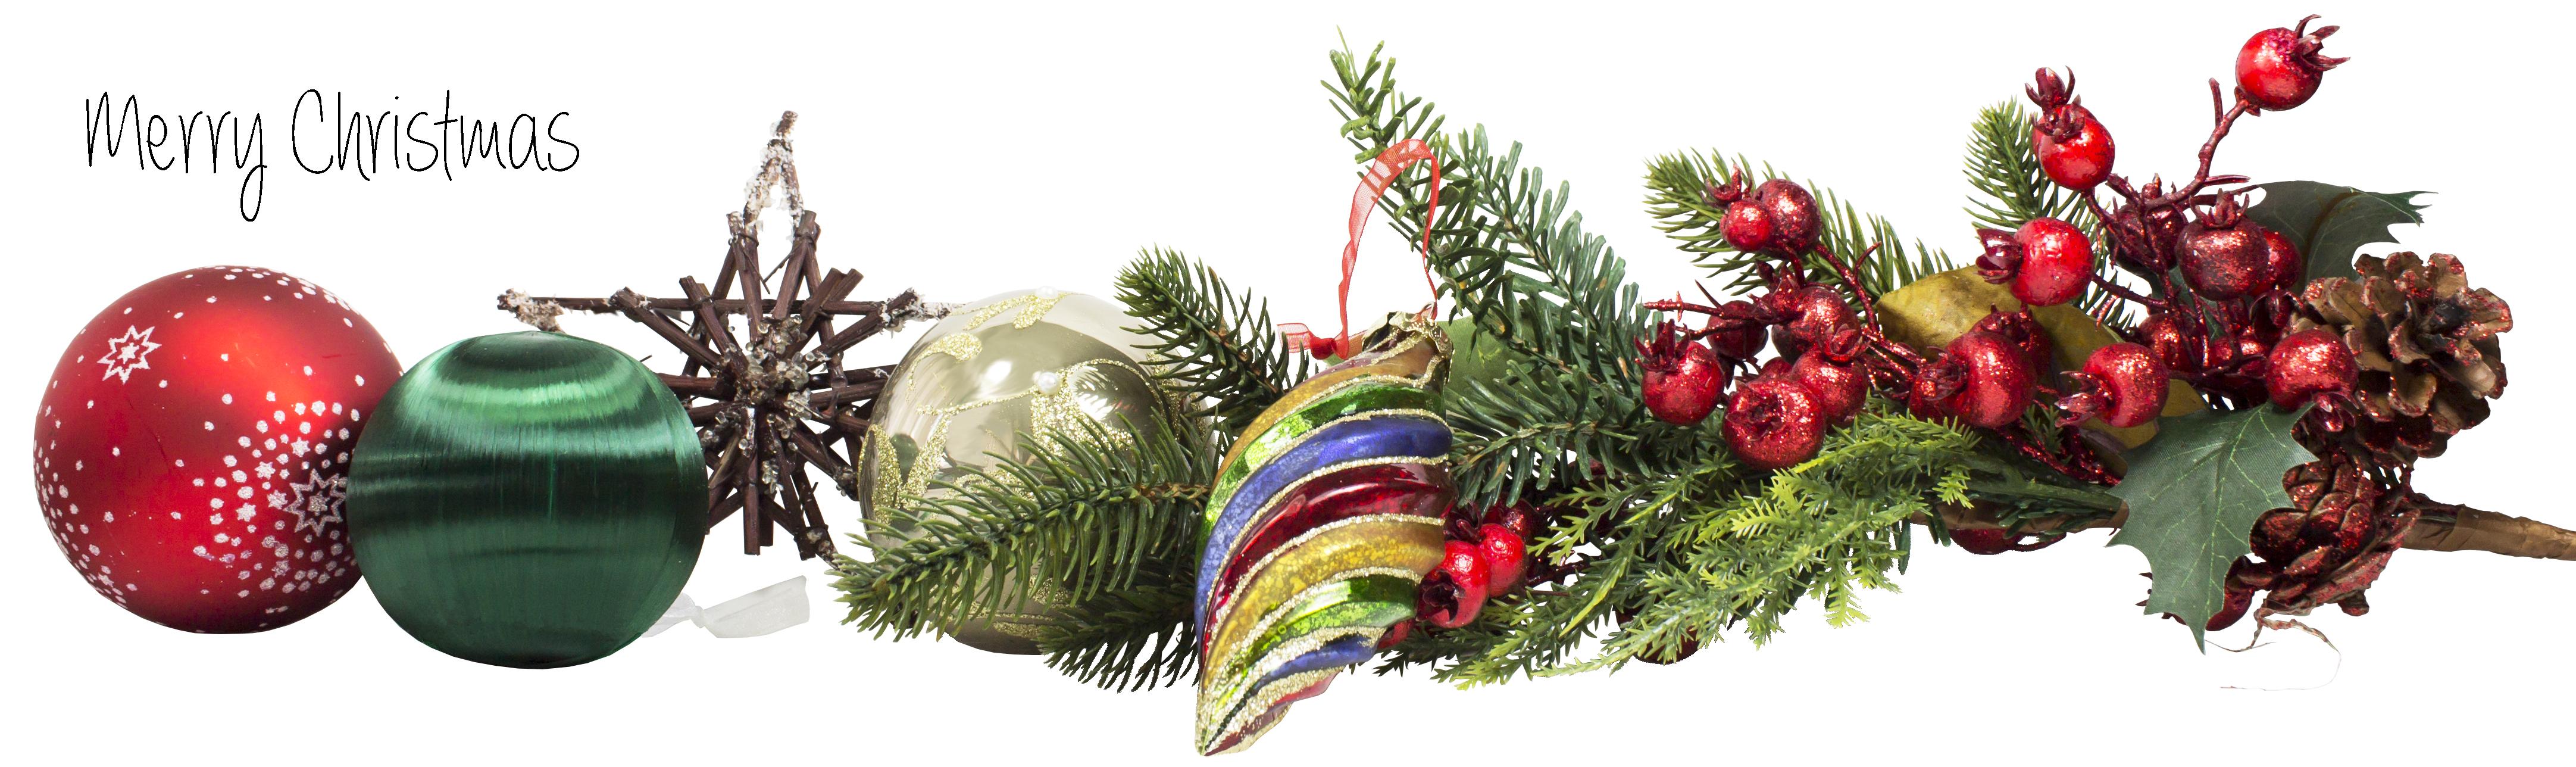 christmas-banner-merry-christmas-2.jpg